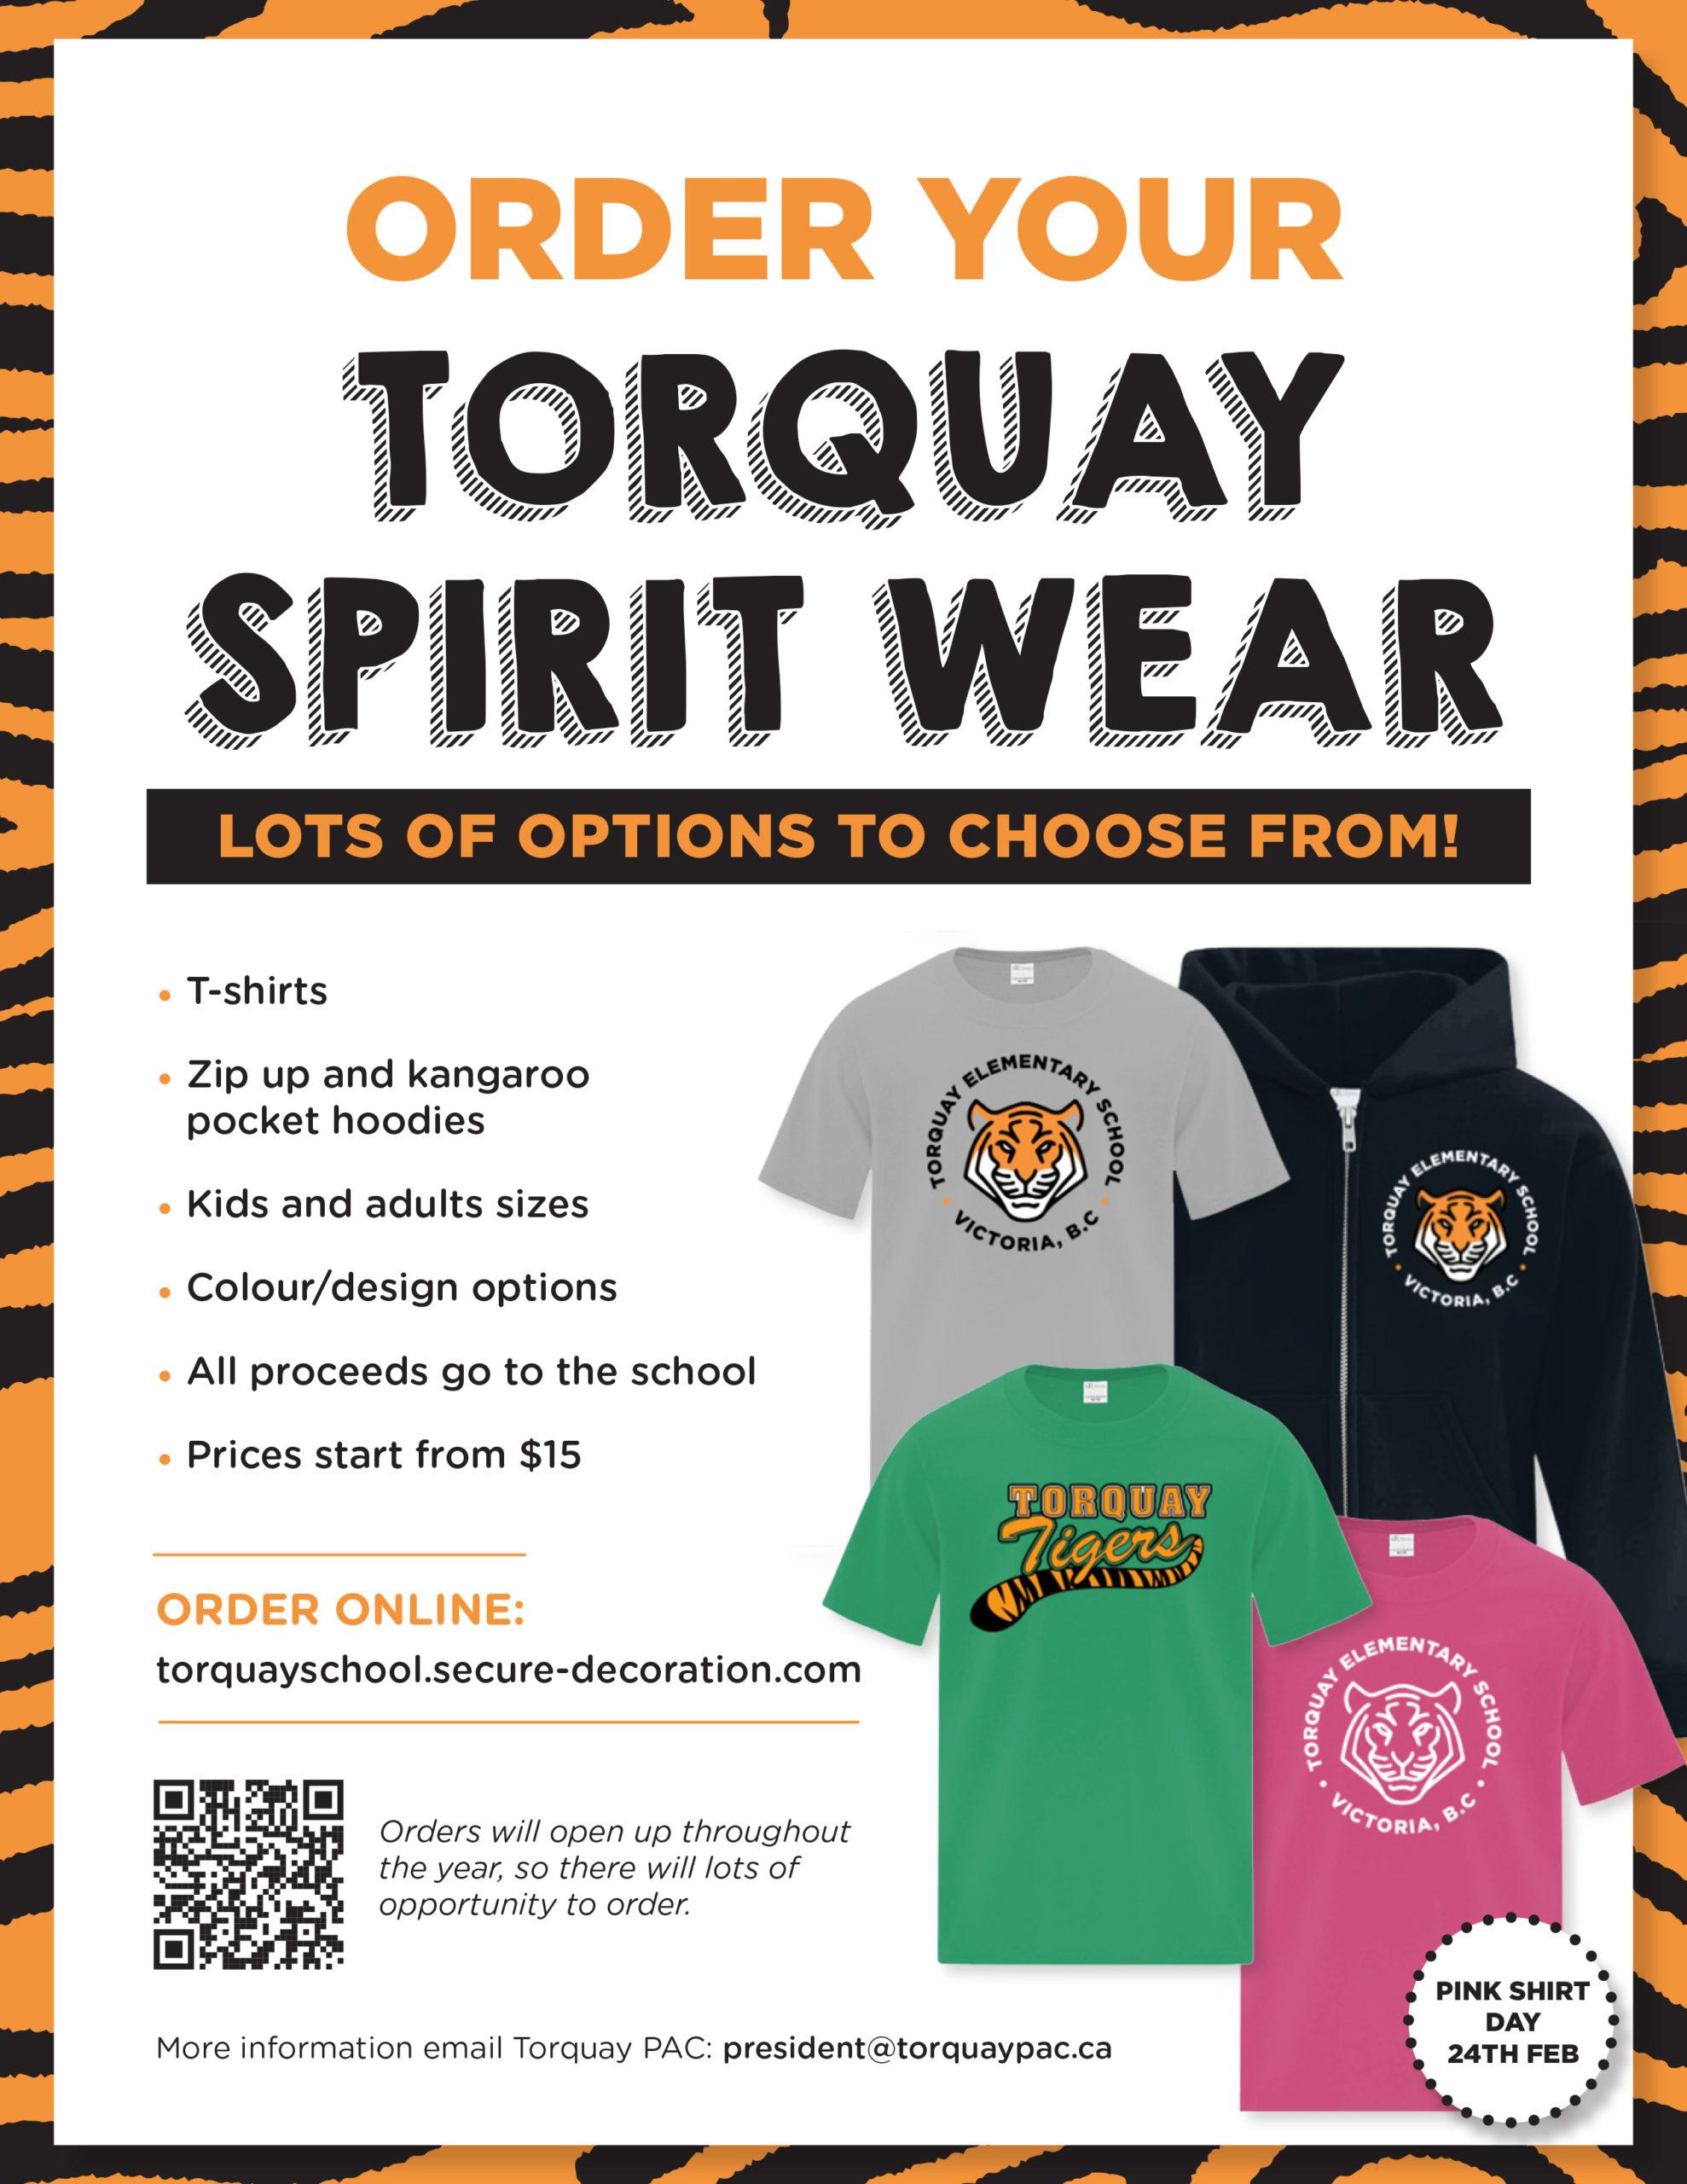 Torquay-Spirit-Wear